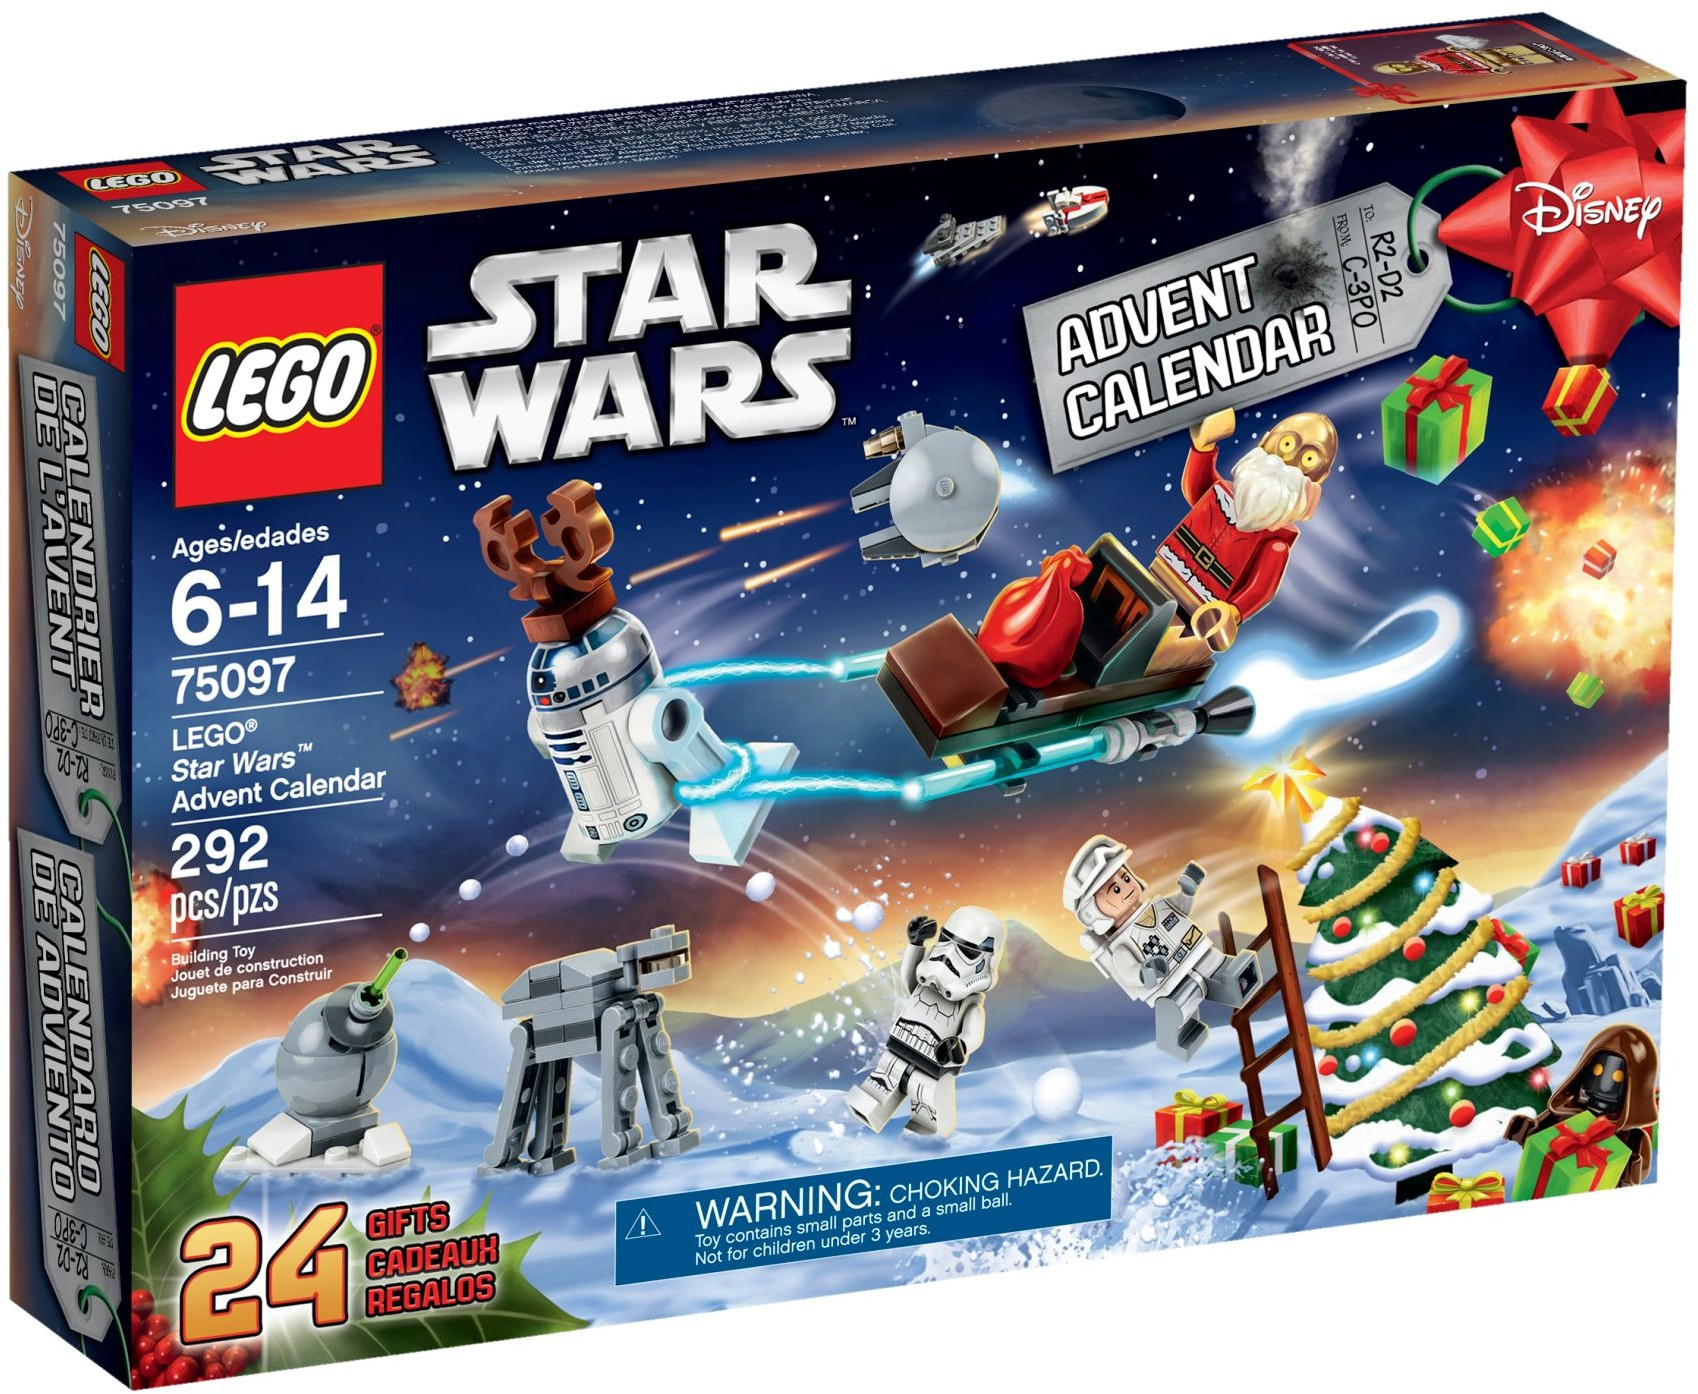 LEGO # 75097 STARWARS ADVENT CALENDER